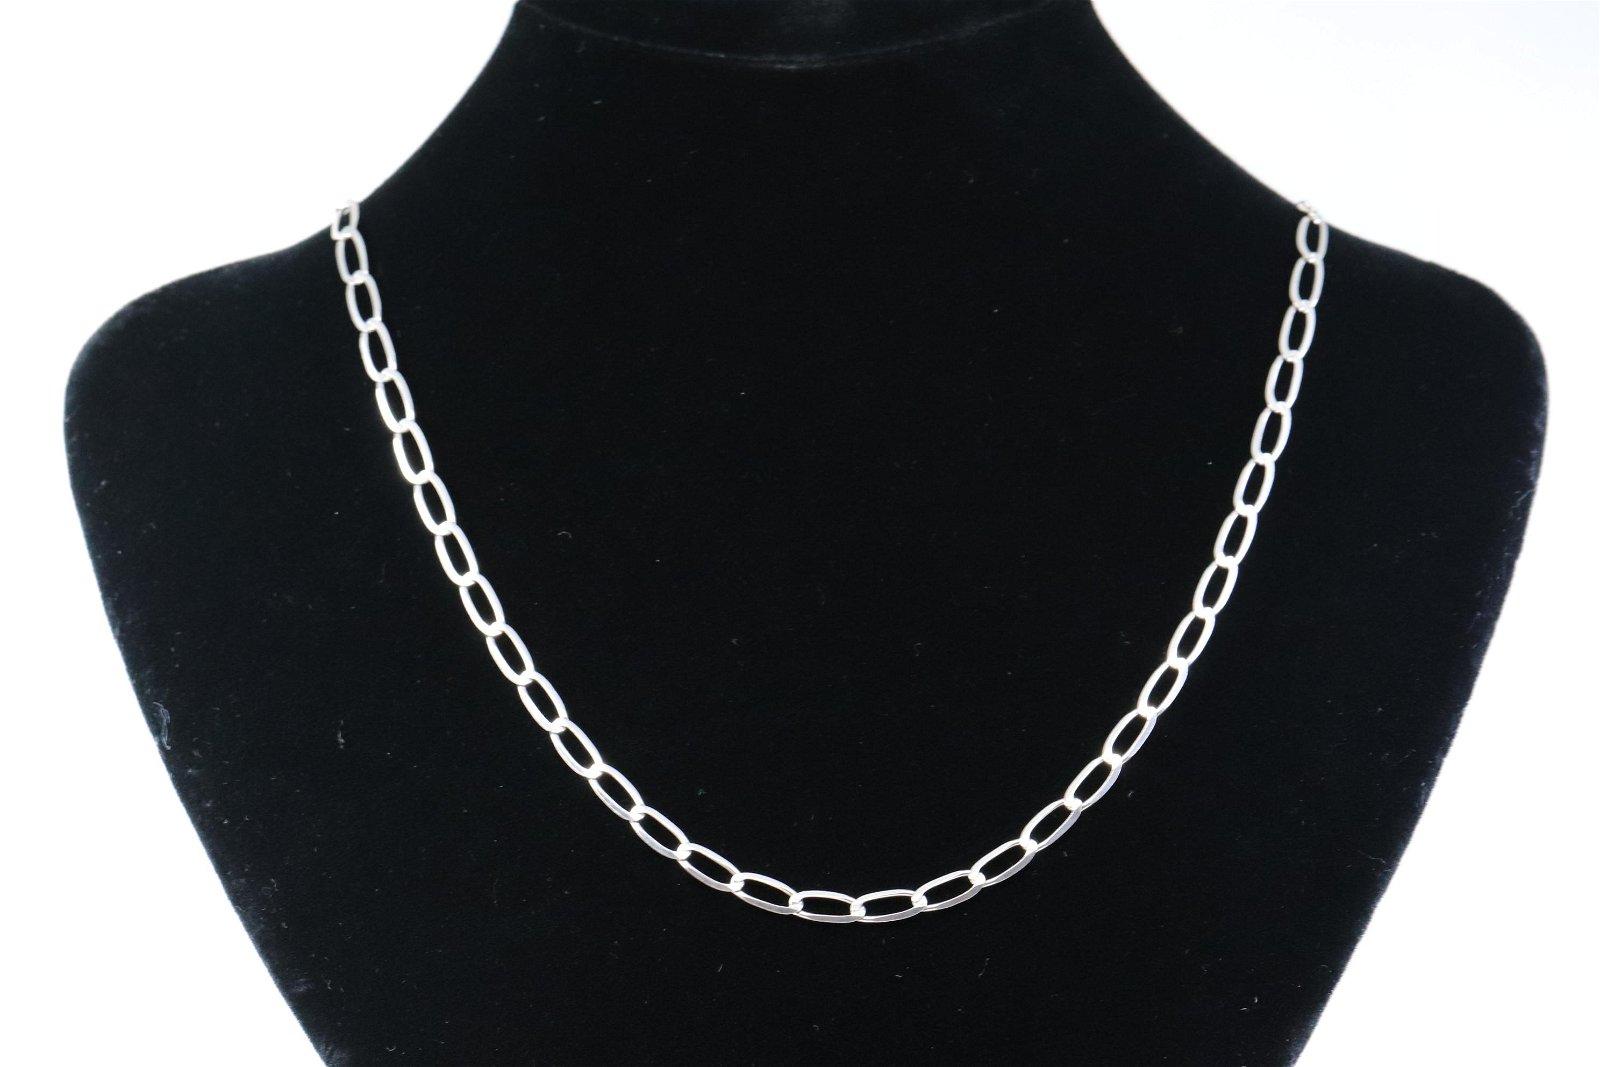 .925 Silver Necklace